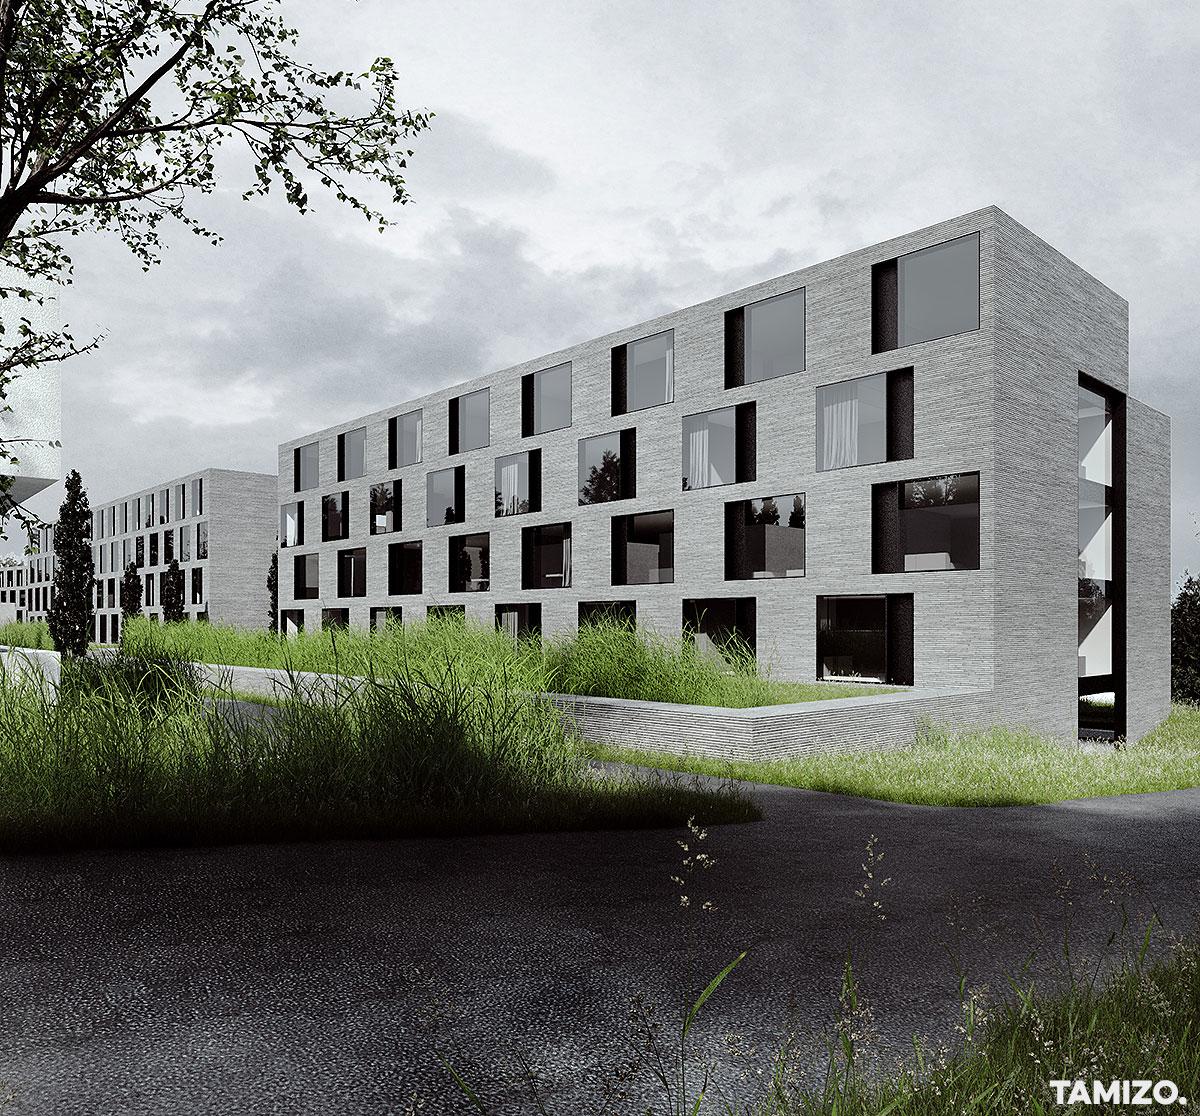 A061_tamizo_architects_competition_tbilisi_georgia_multifamily_houseing_realestate_21